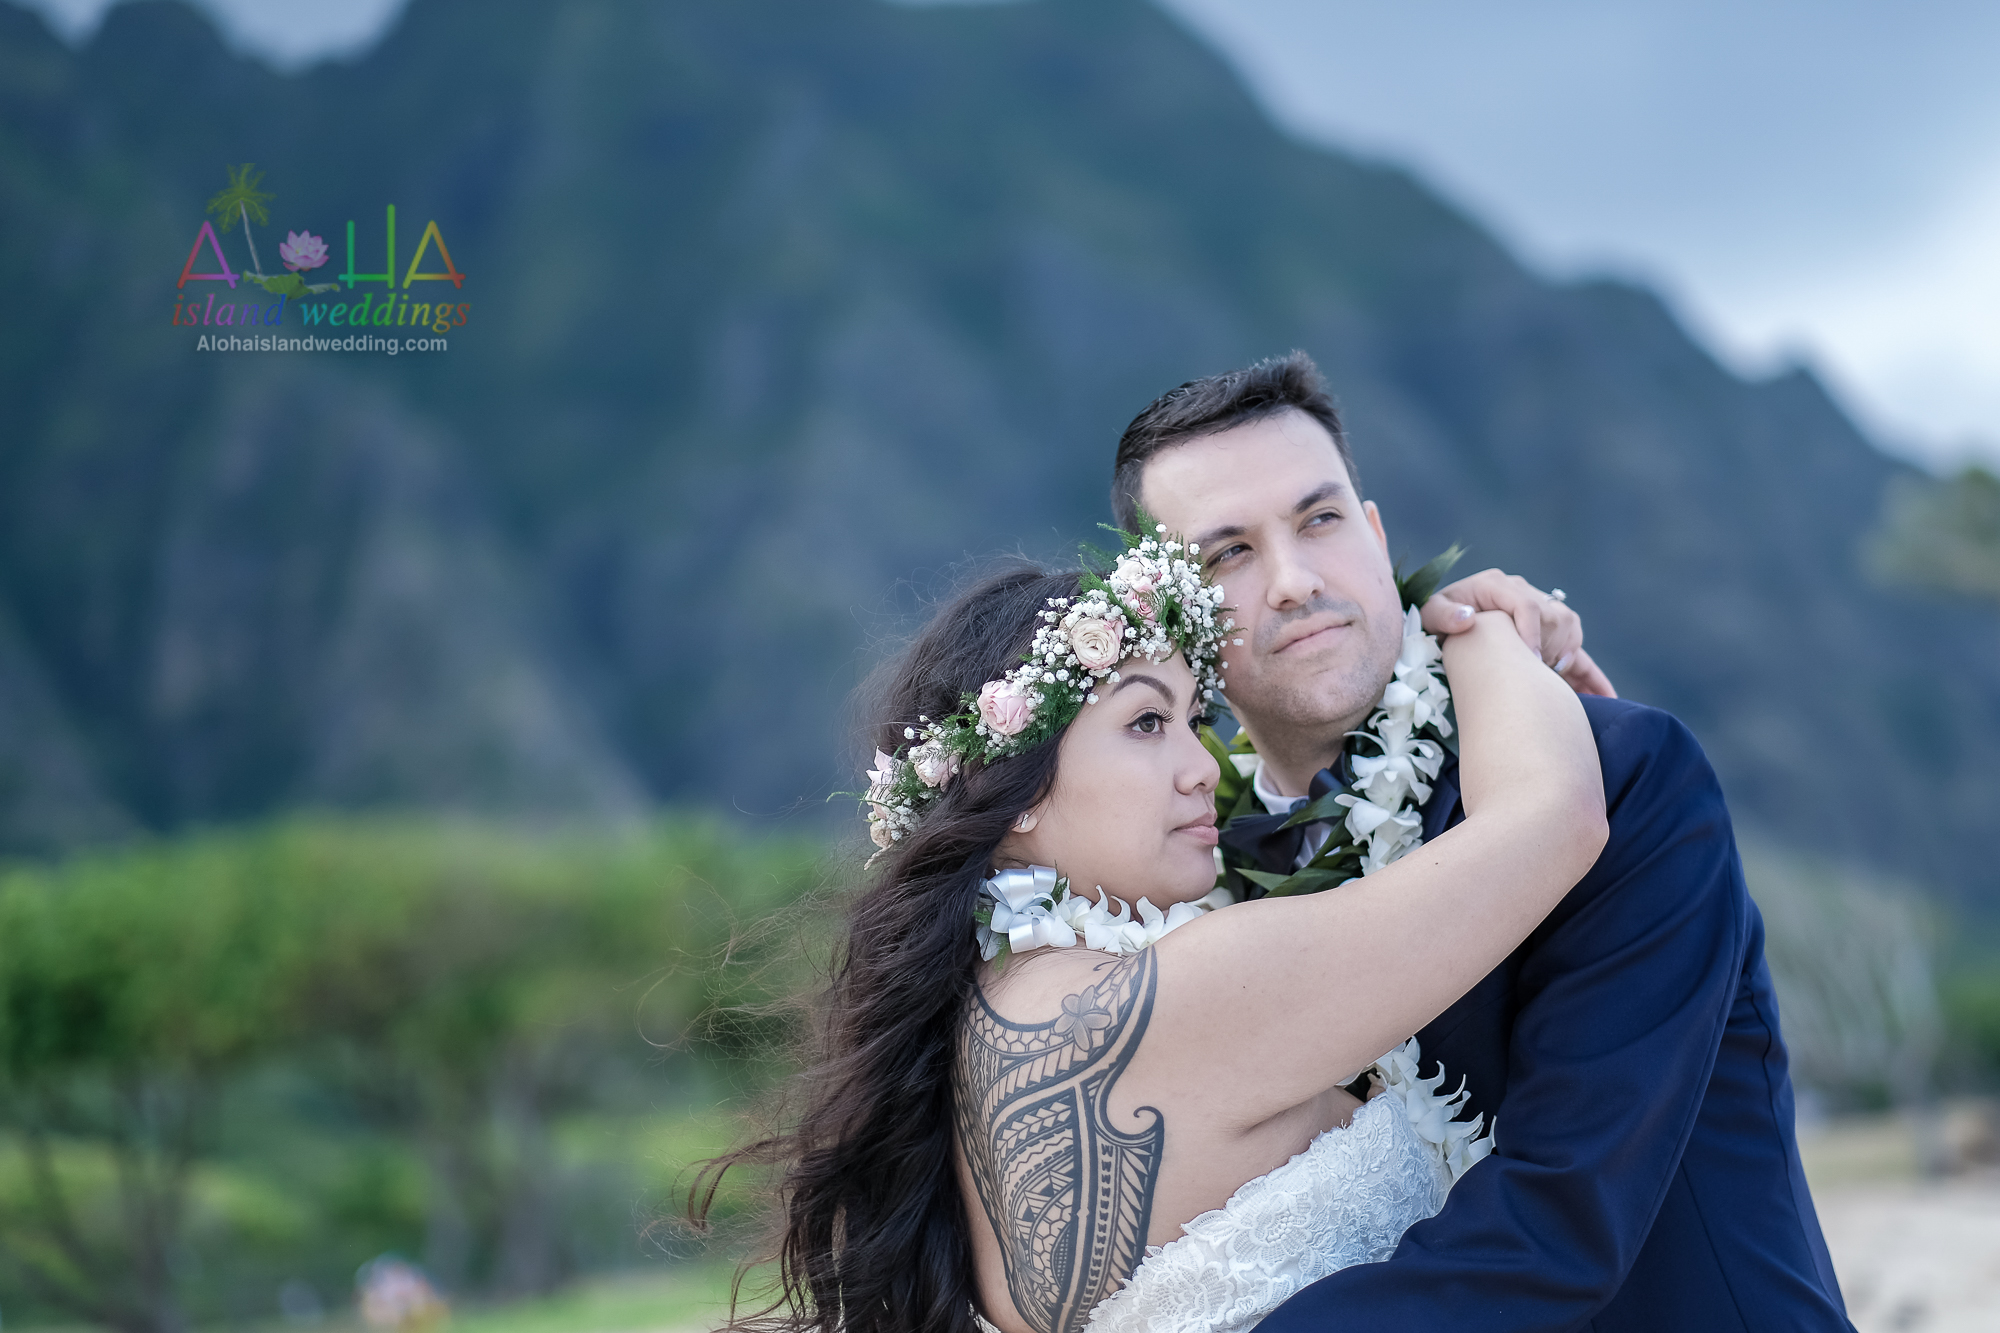 Hawaii weddings and events, Kualoa-120